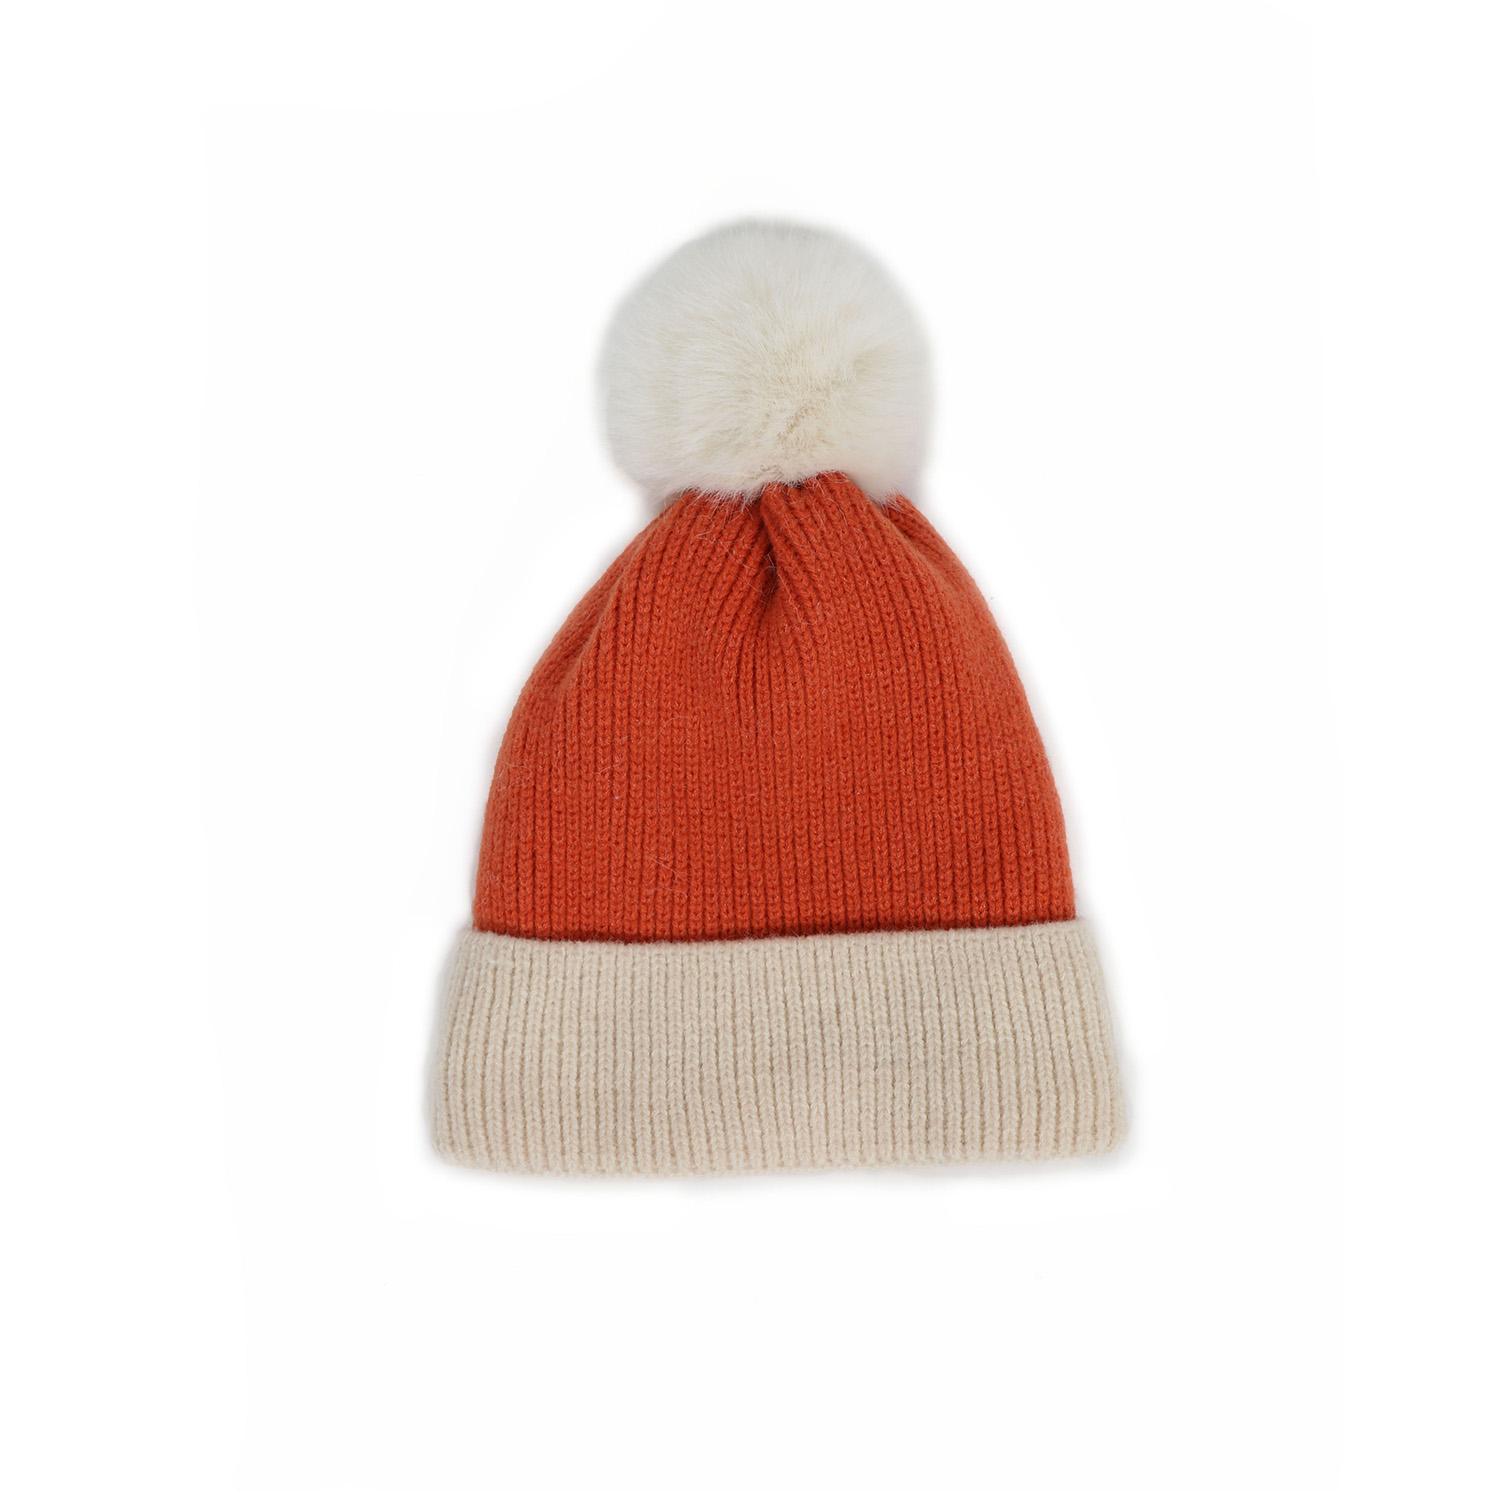 Powder – Bonnie Tangerine/Cream Pom Pom Hat with Powder Presentation Gift Bag